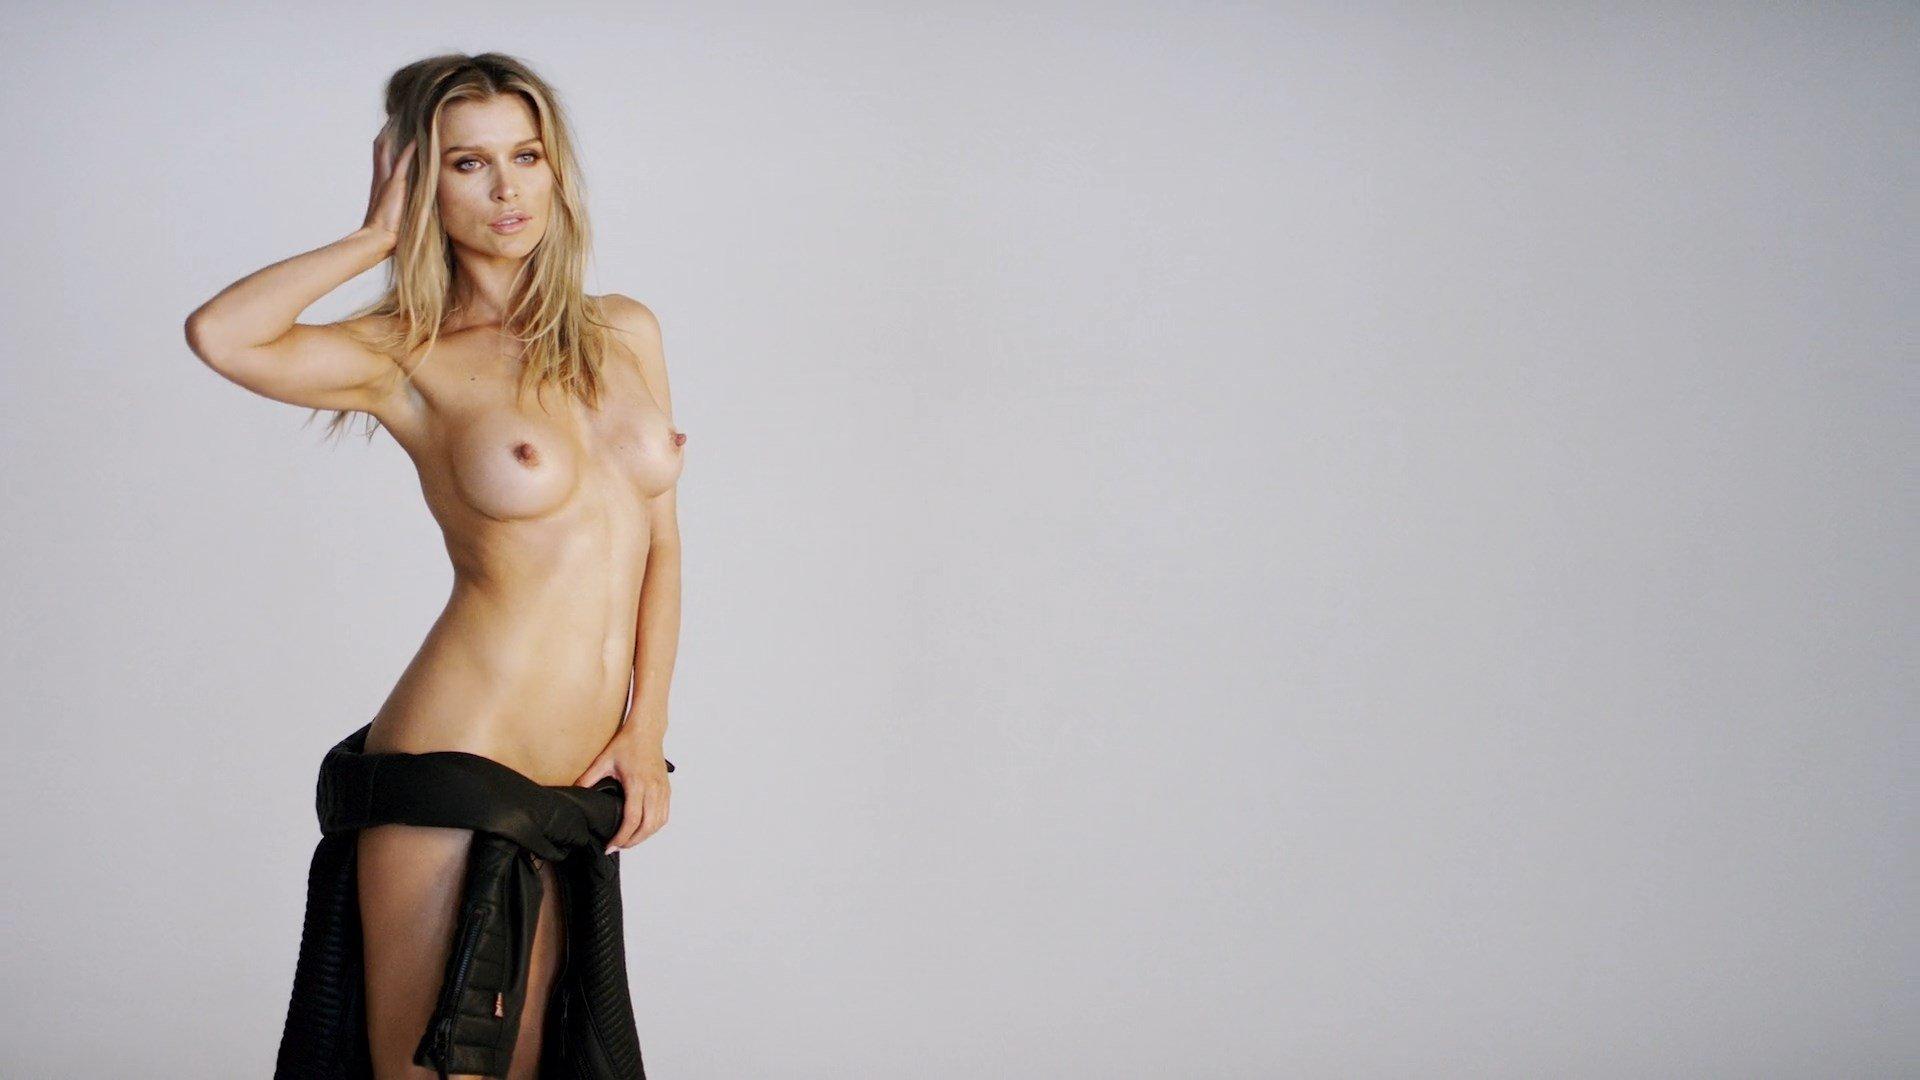 Naked celebs psp wallpapers